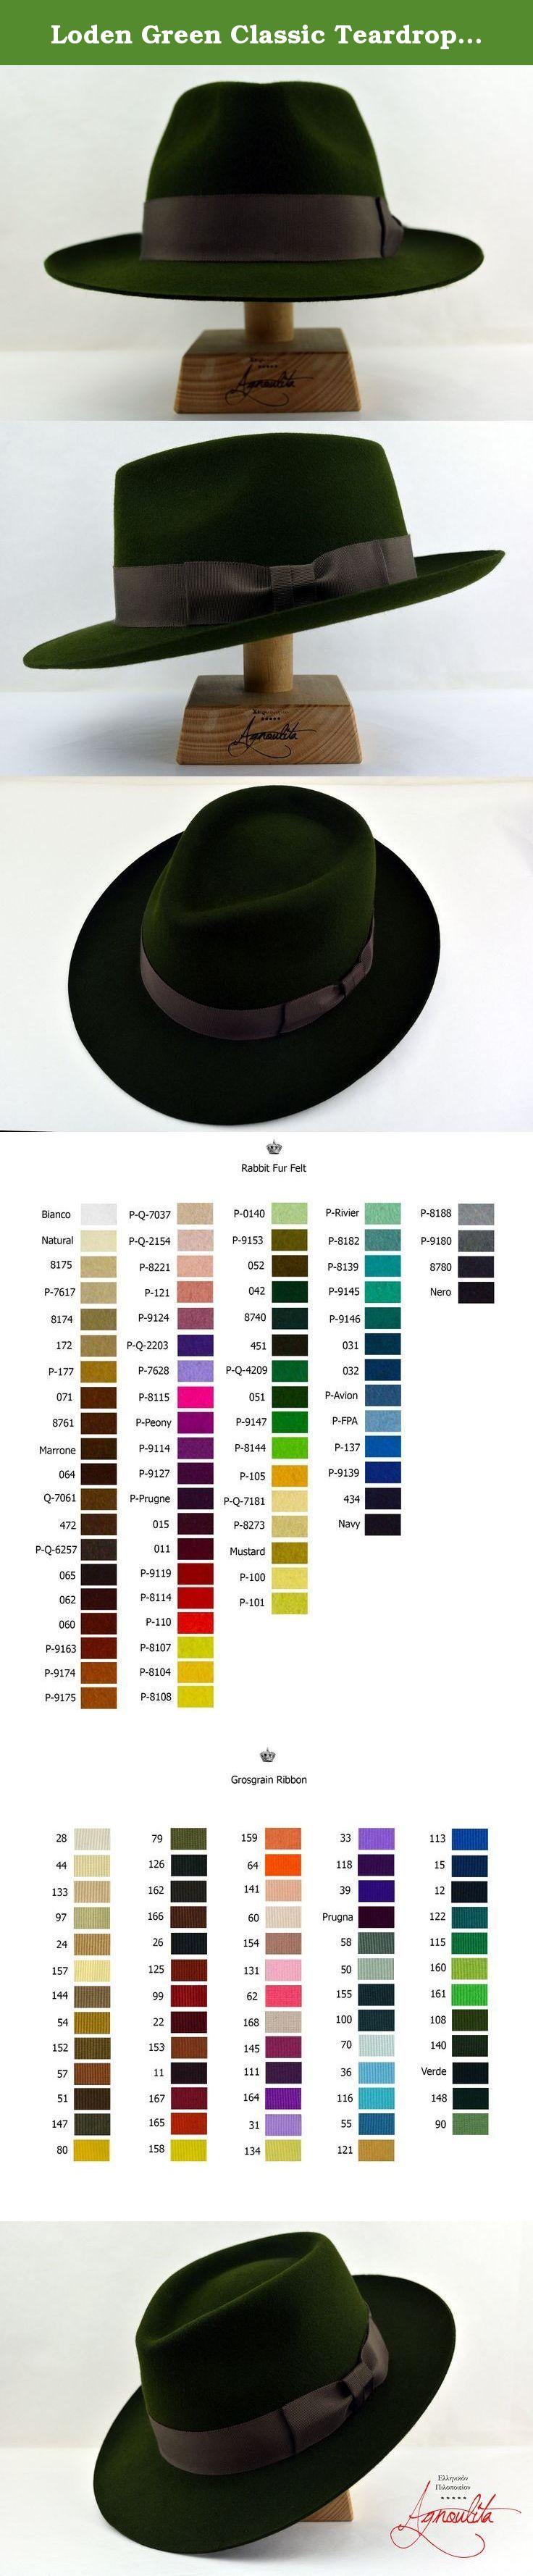 Loden Green Classic Teardrop Fedora - Rabbit Fur Felt Handmade Fedora Hat.  Loden seems like f5f254aab325